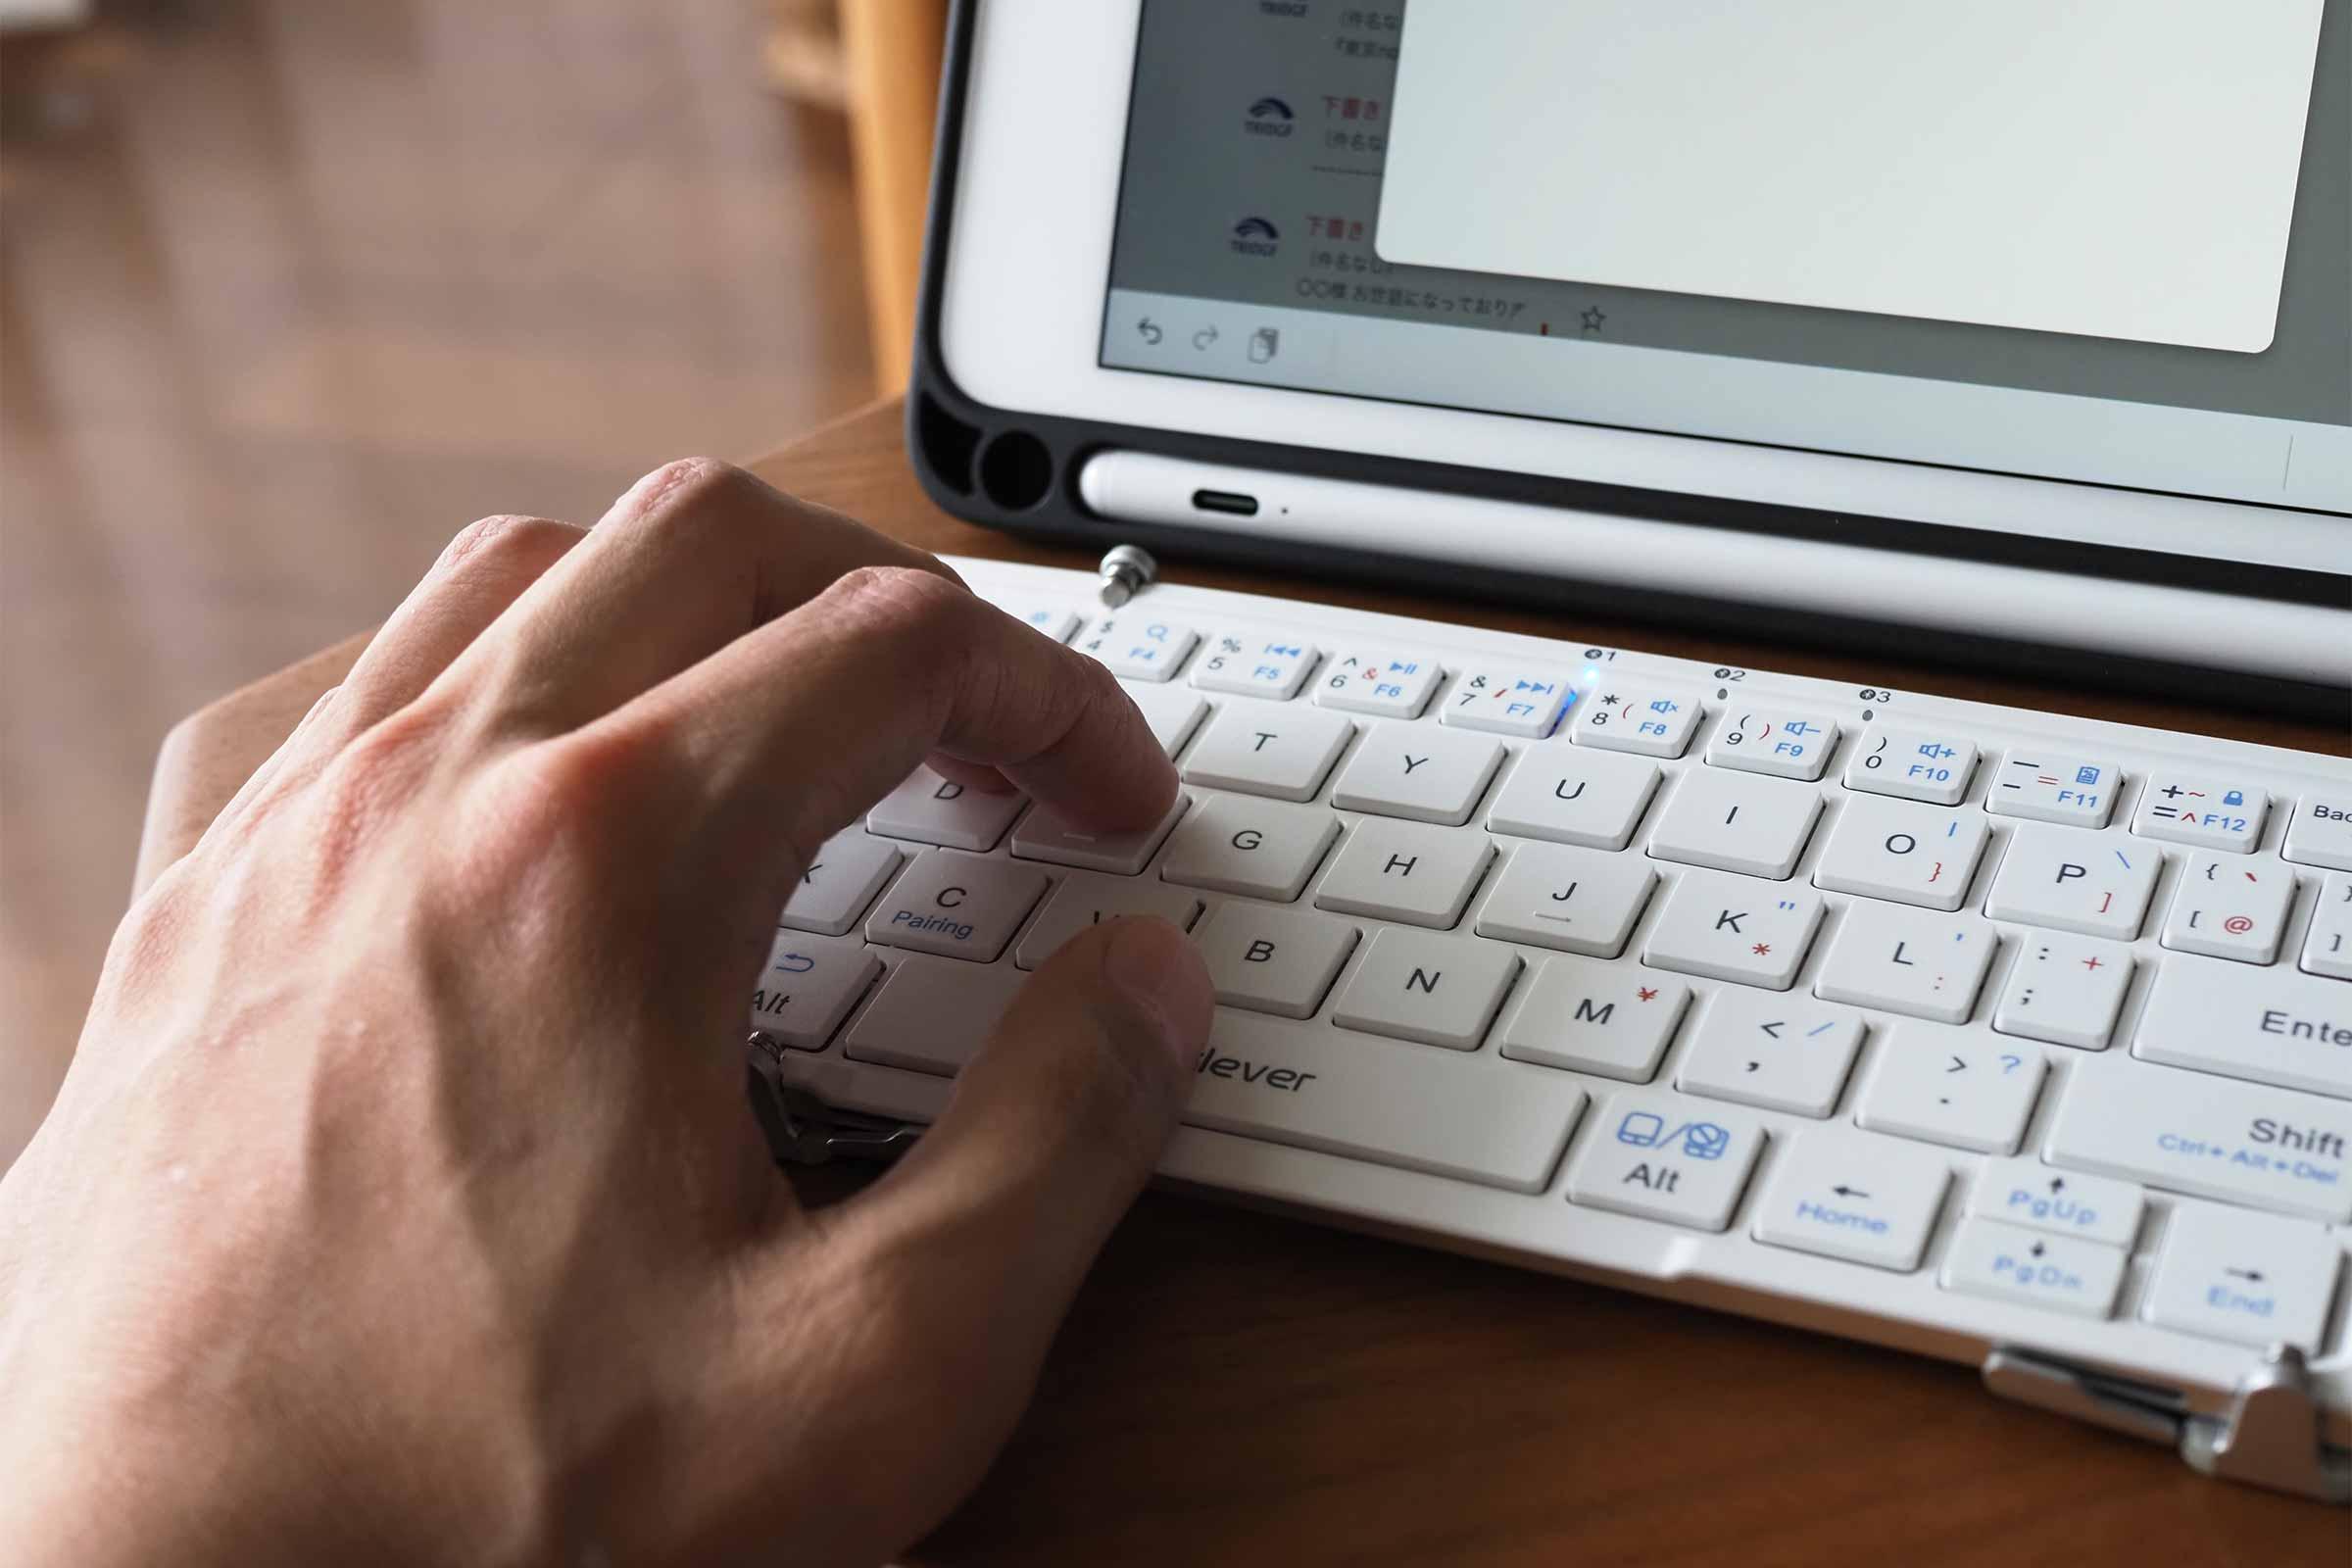 iclever,Bluetoothキーボード,iPad,iPad mini,コンパクト,薄い,安い,タッチパッド,軽い,電池